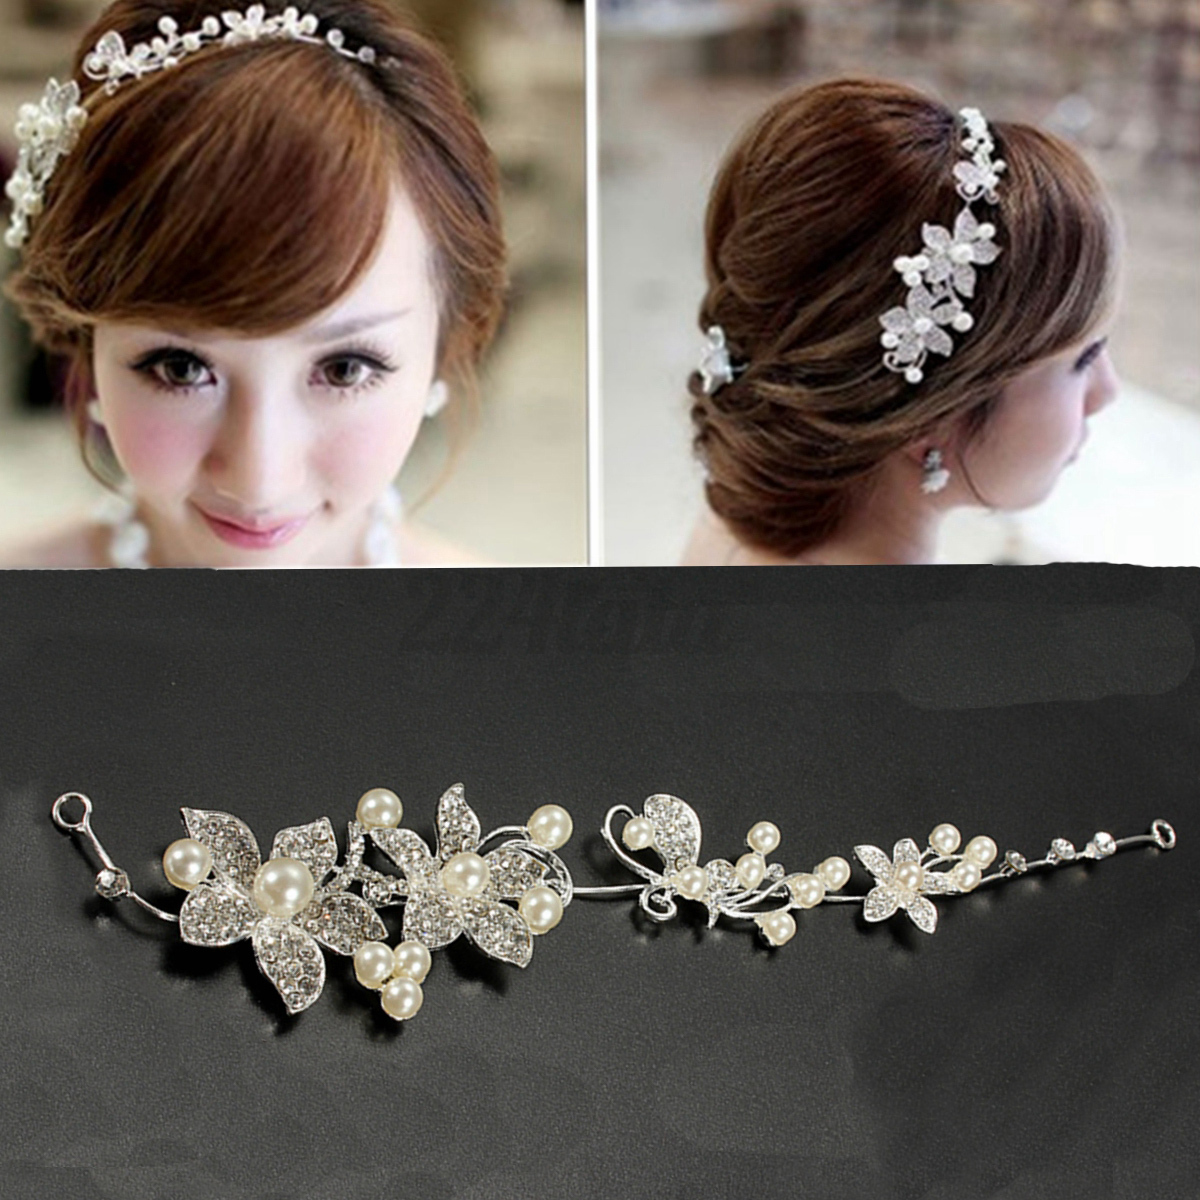 tiara haarreif braut party stirnband diadem deko hochzeit haarschmuck haarband ebay. Black Bedroom Furniture Sets. Home Design Ideas